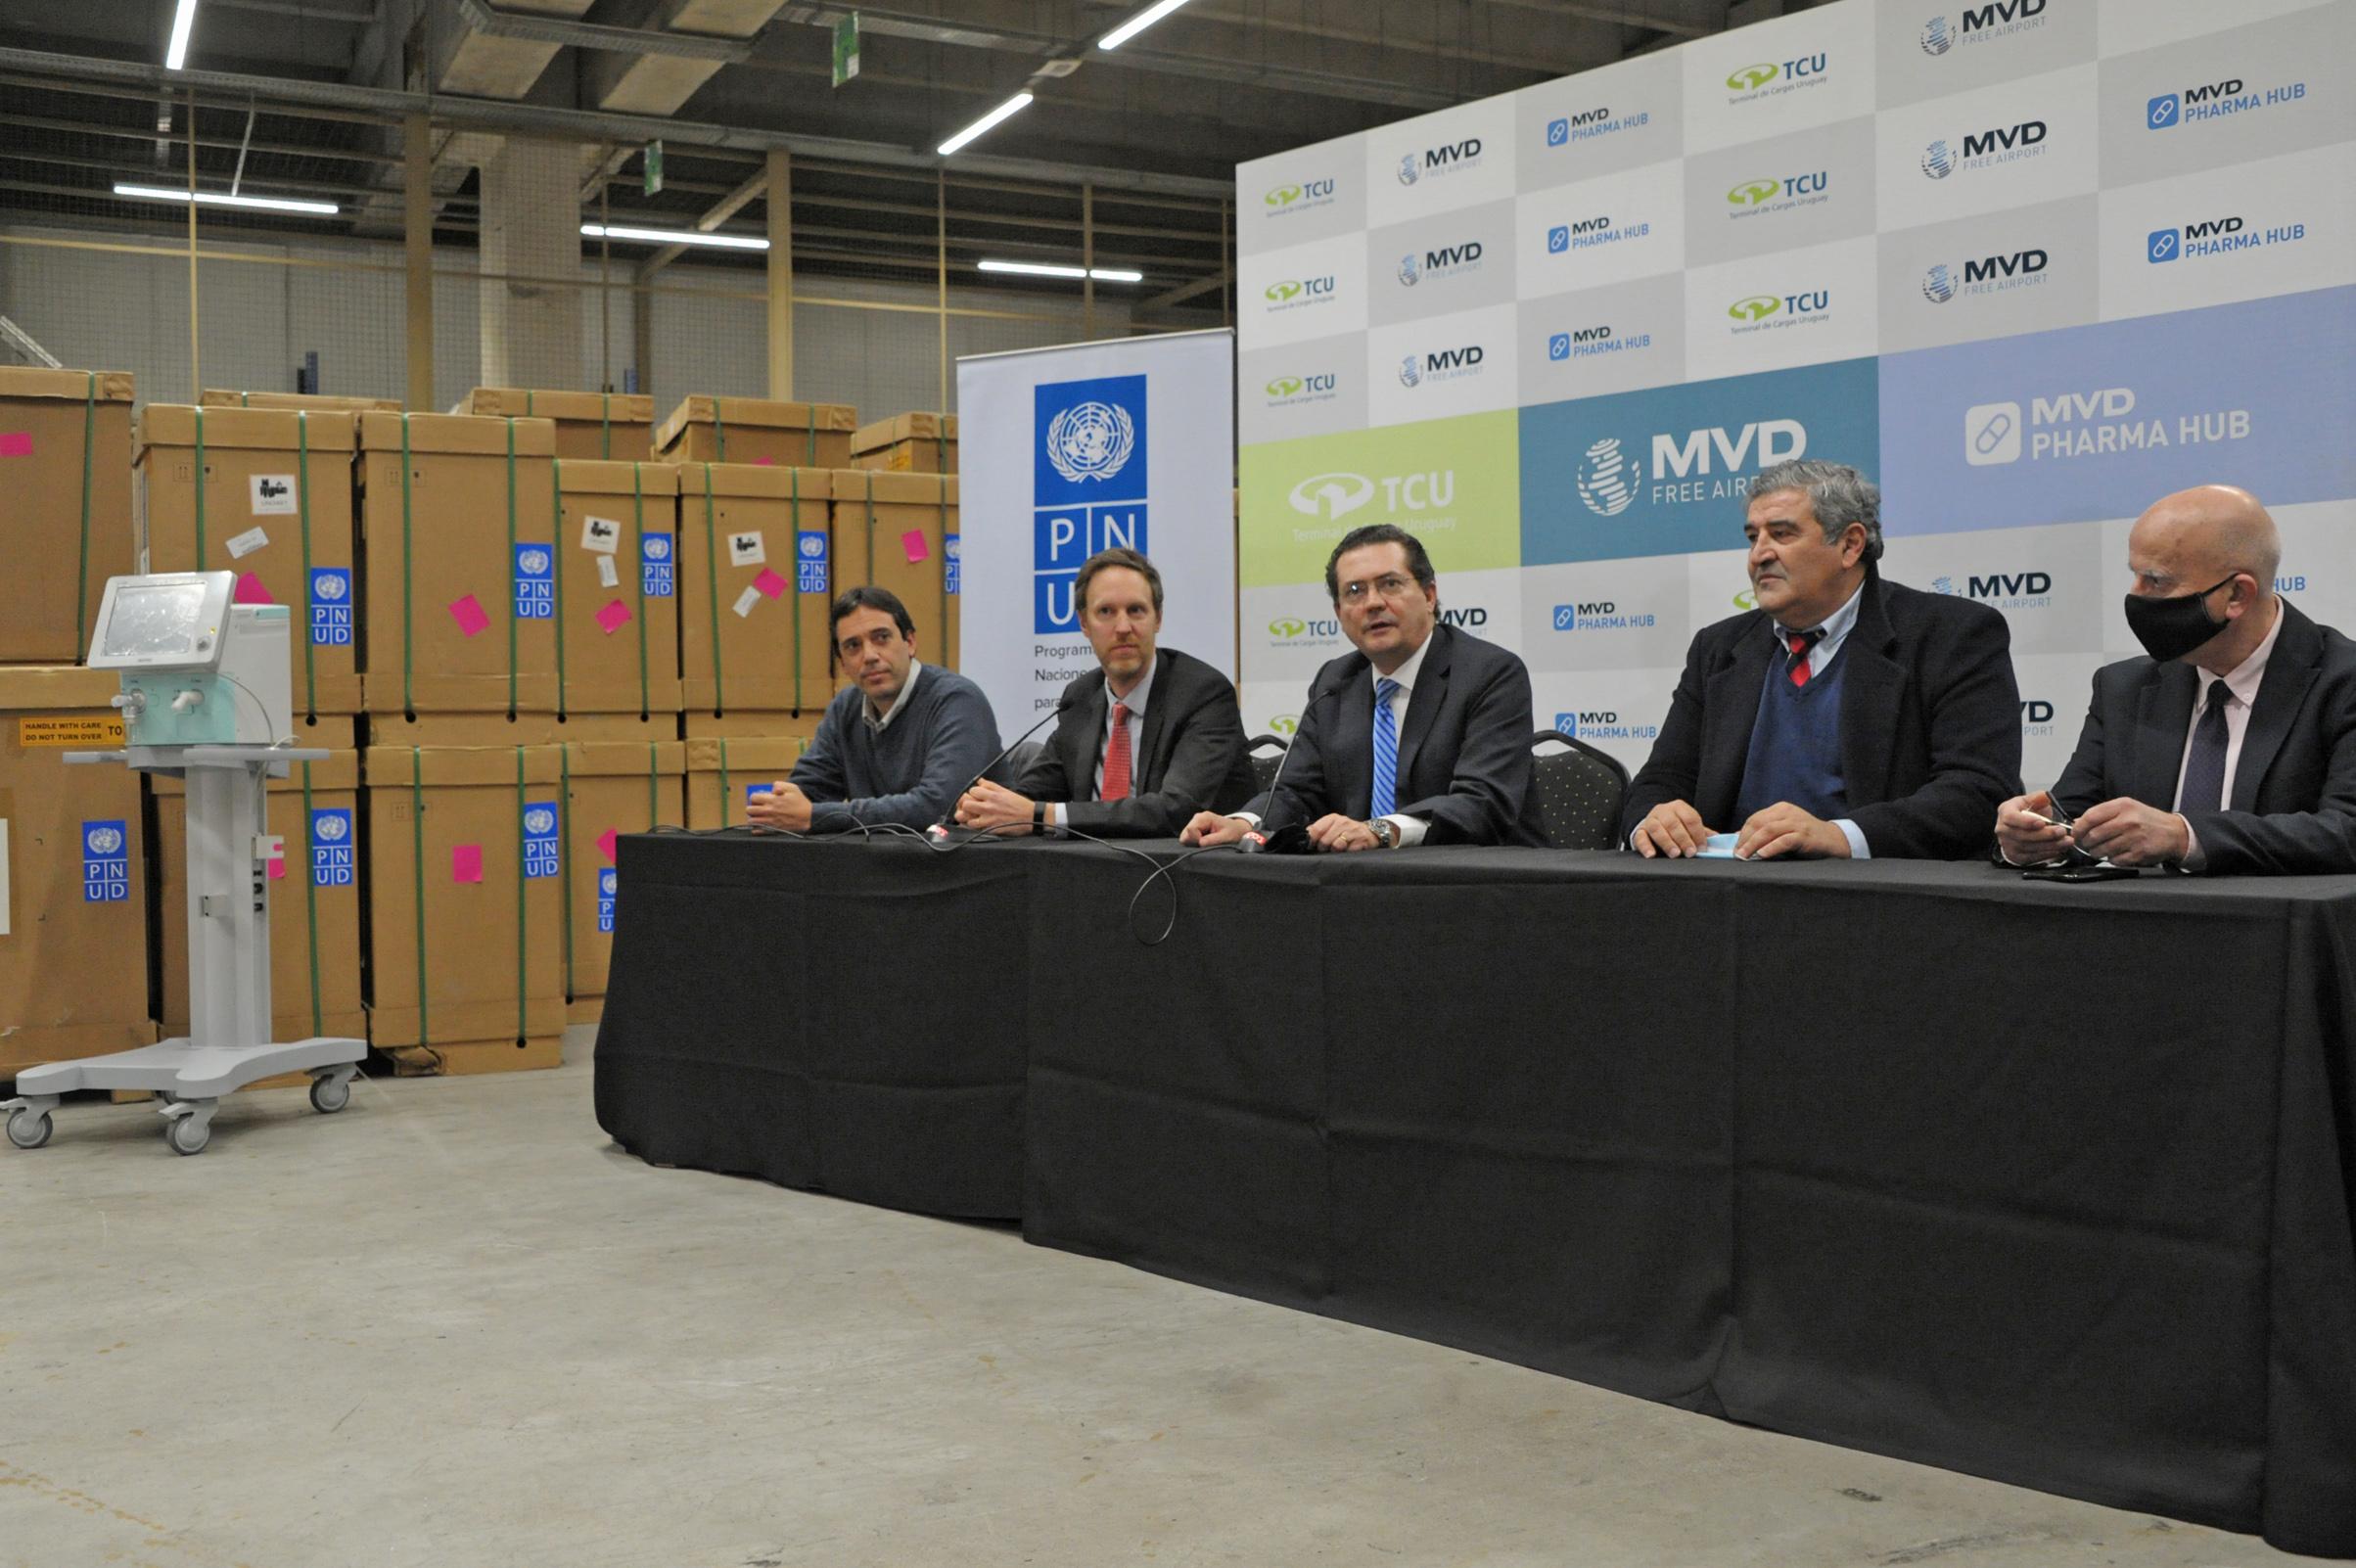 Bruno Guella, Stefan Liller, Rodrigo Ferrés, Pablo Picabea y Mariano Berro